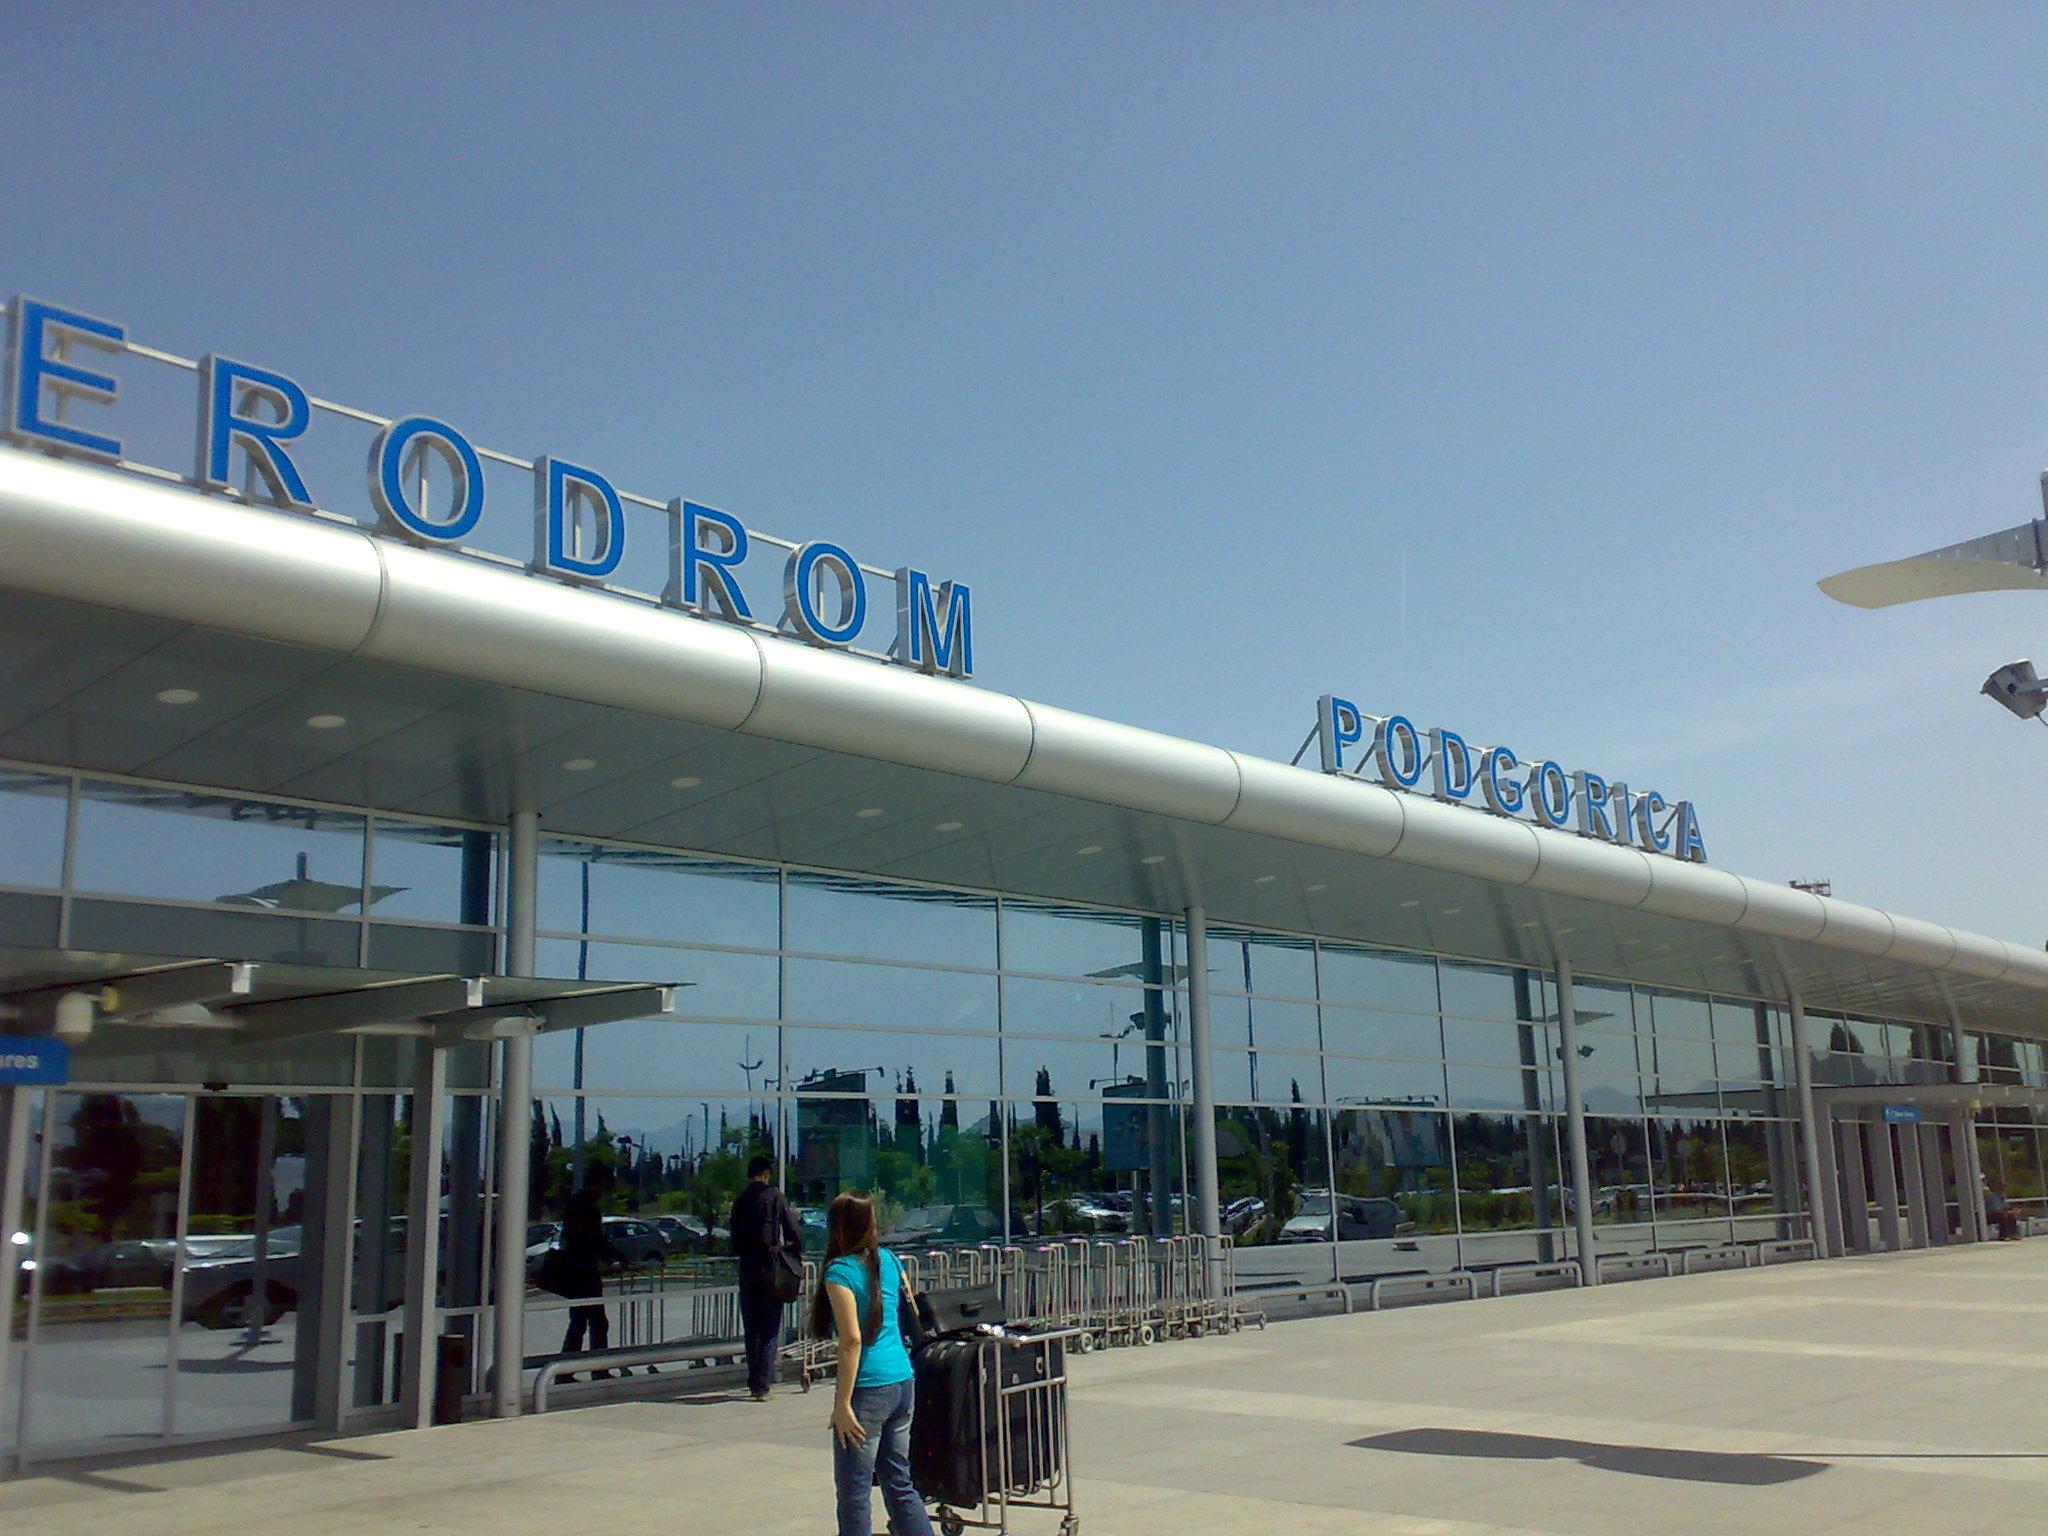 Zračna luka Podgorica